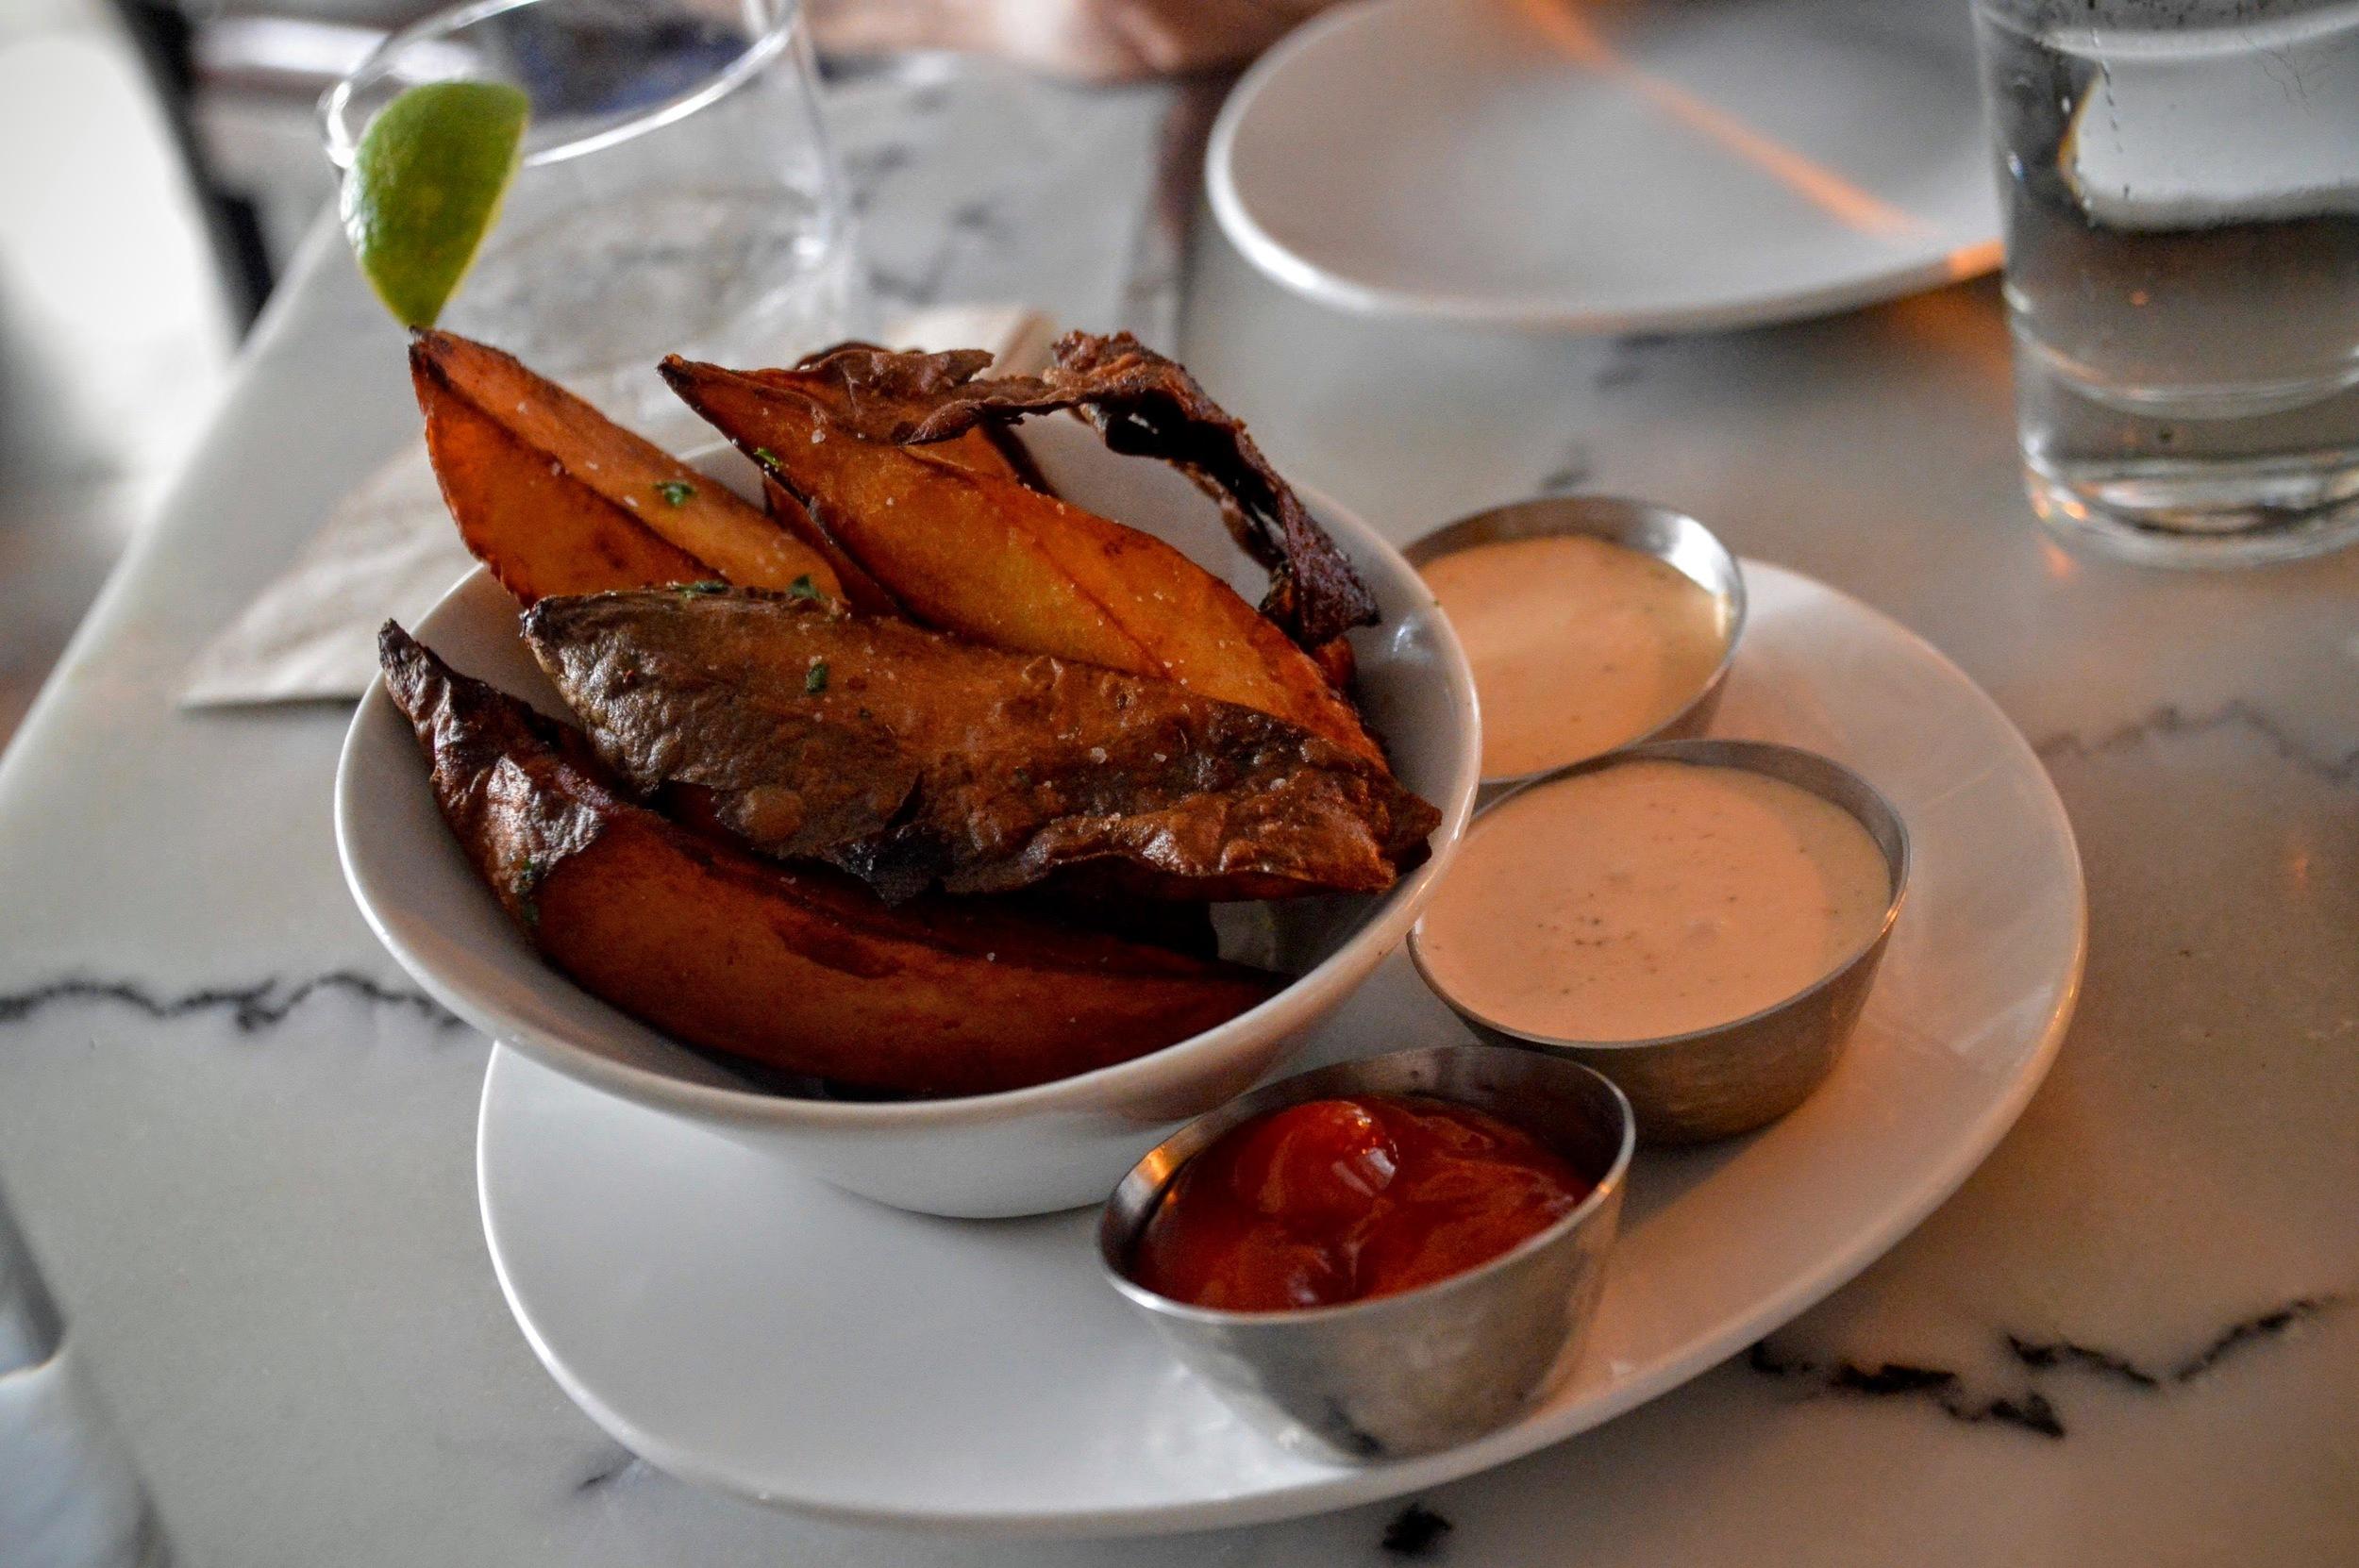 Korean Sweet Potato Steak Frites